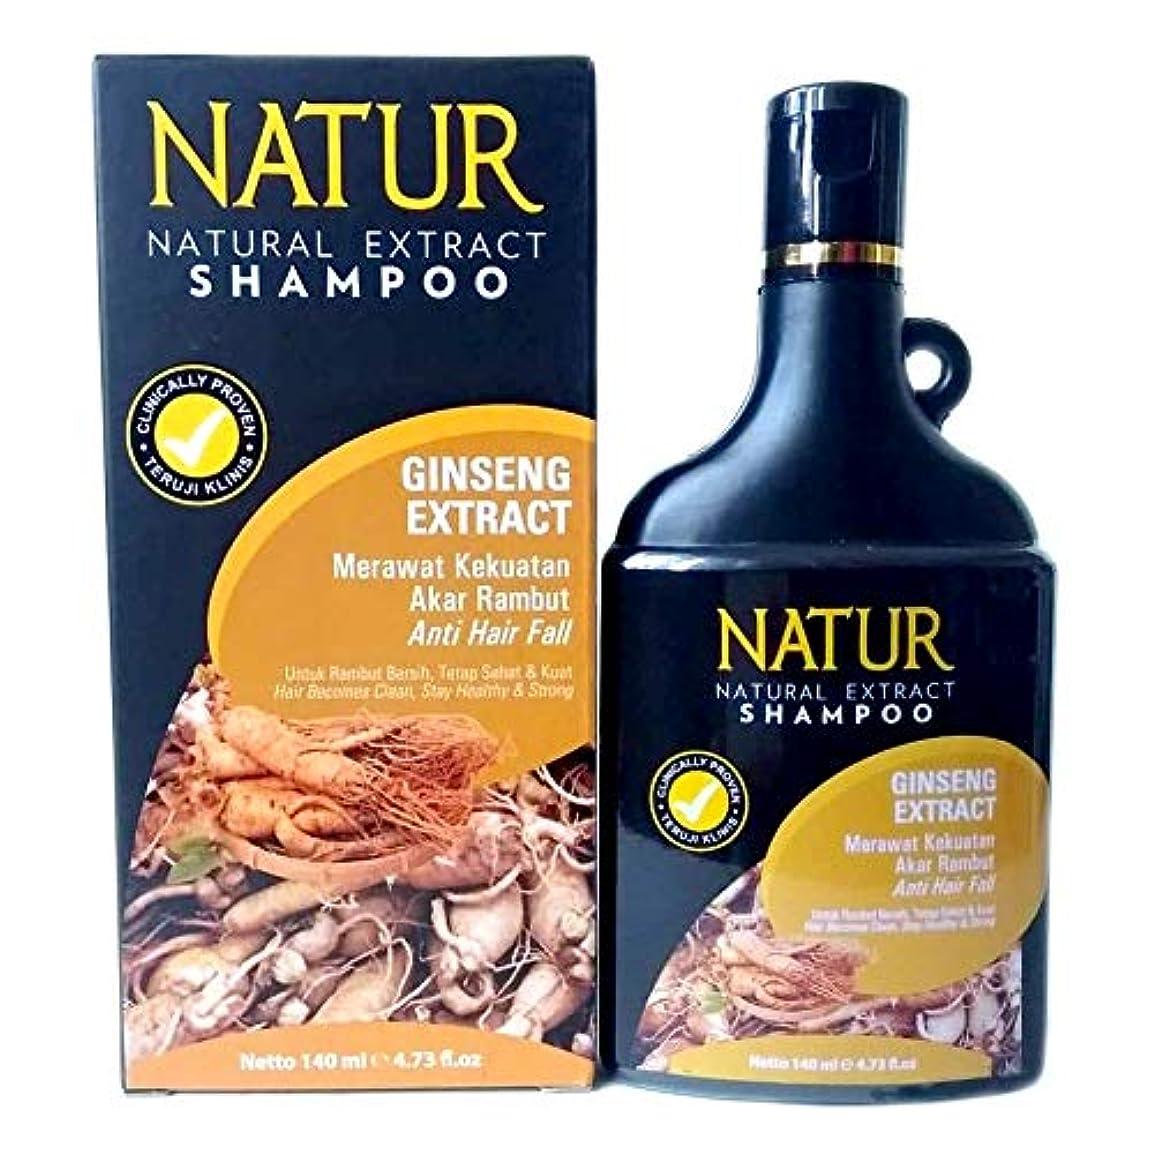 NATUR ナトゥール 天然植物エキス配合 ハーバルシャンプー 140ml Ginseng ジンセン [海外直商品]